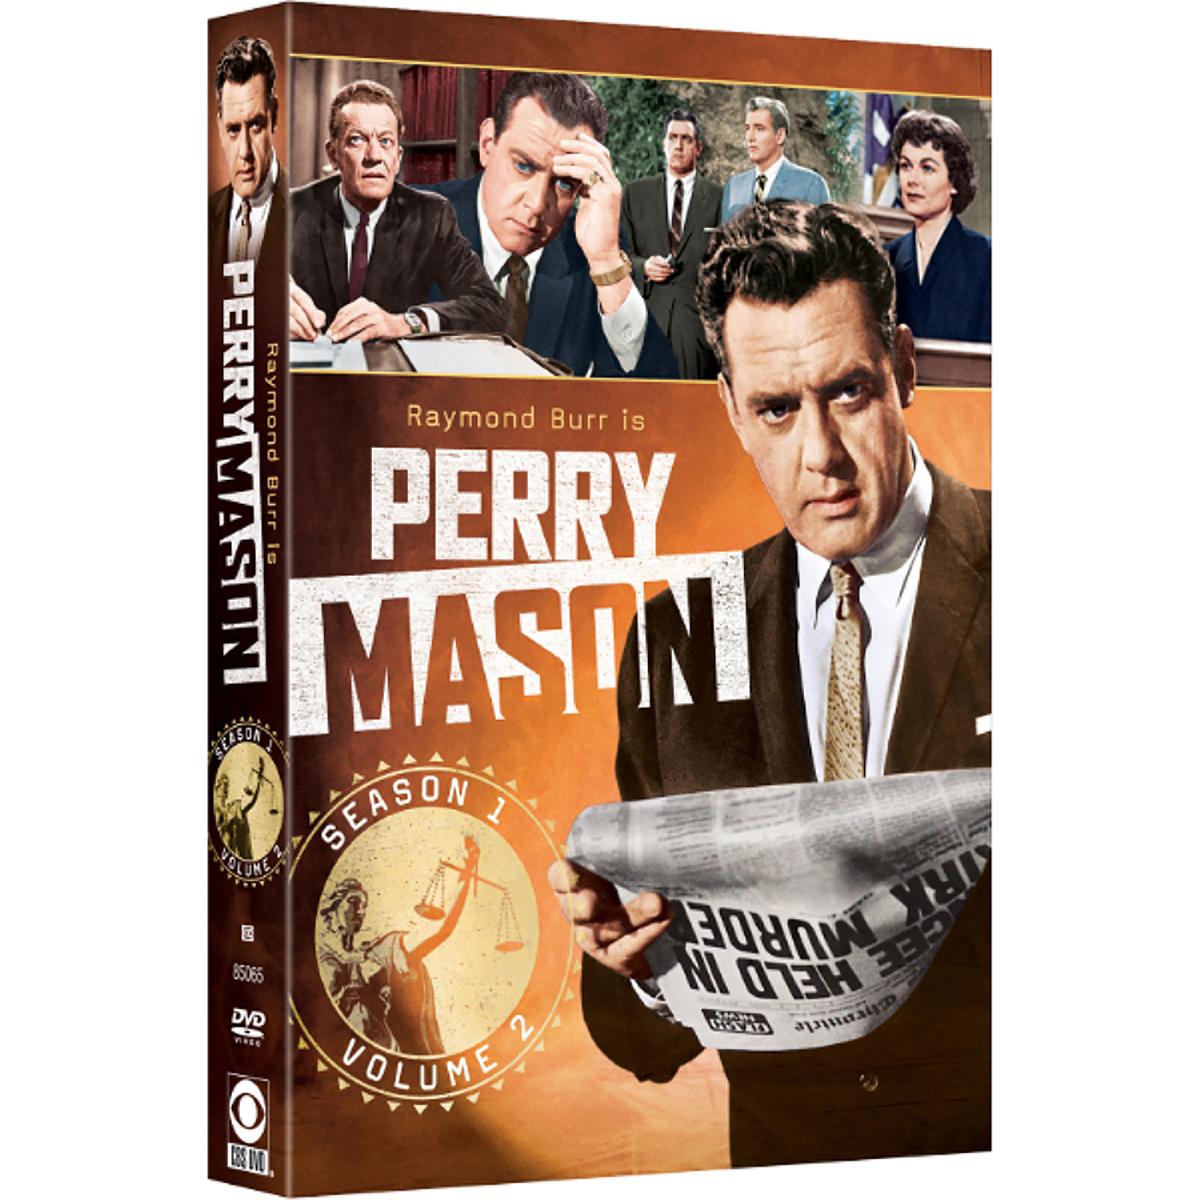 Perry Mason: Season 1 - Volume 2 DVD